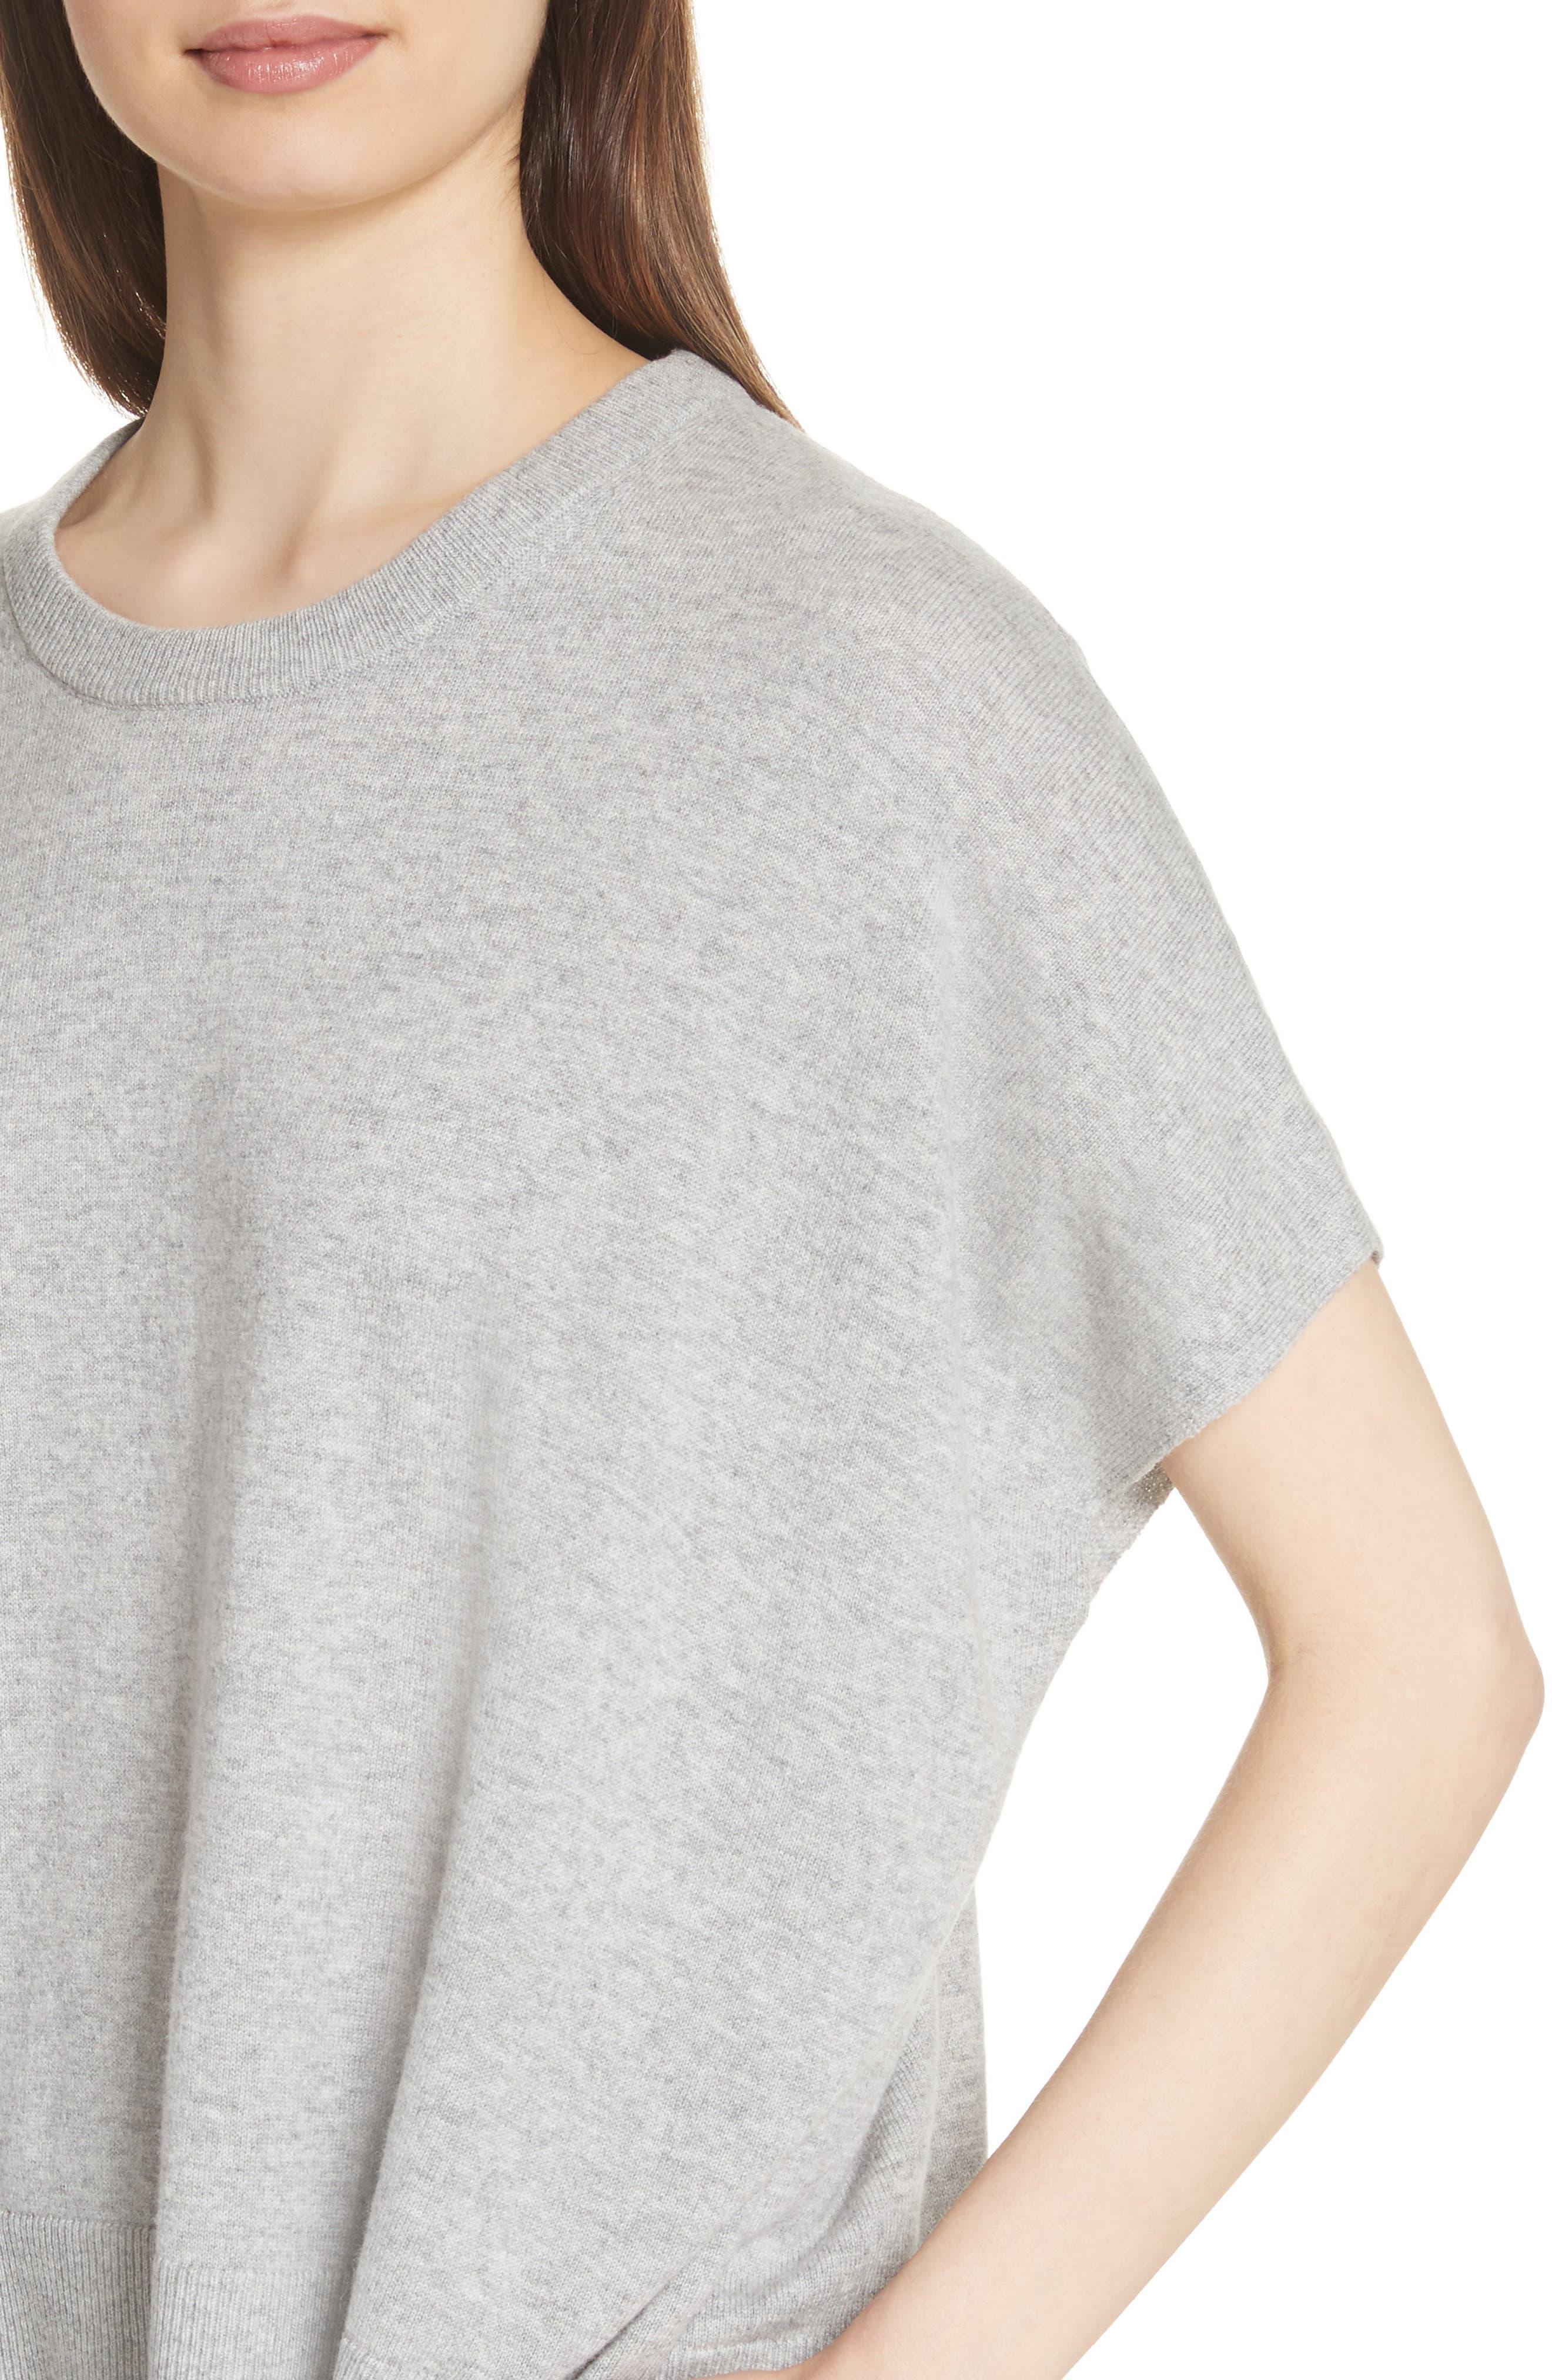 Cashmere Draped Pullover,                             Alternate thumbnail 4, color,                             PEARL GREY MELANGE